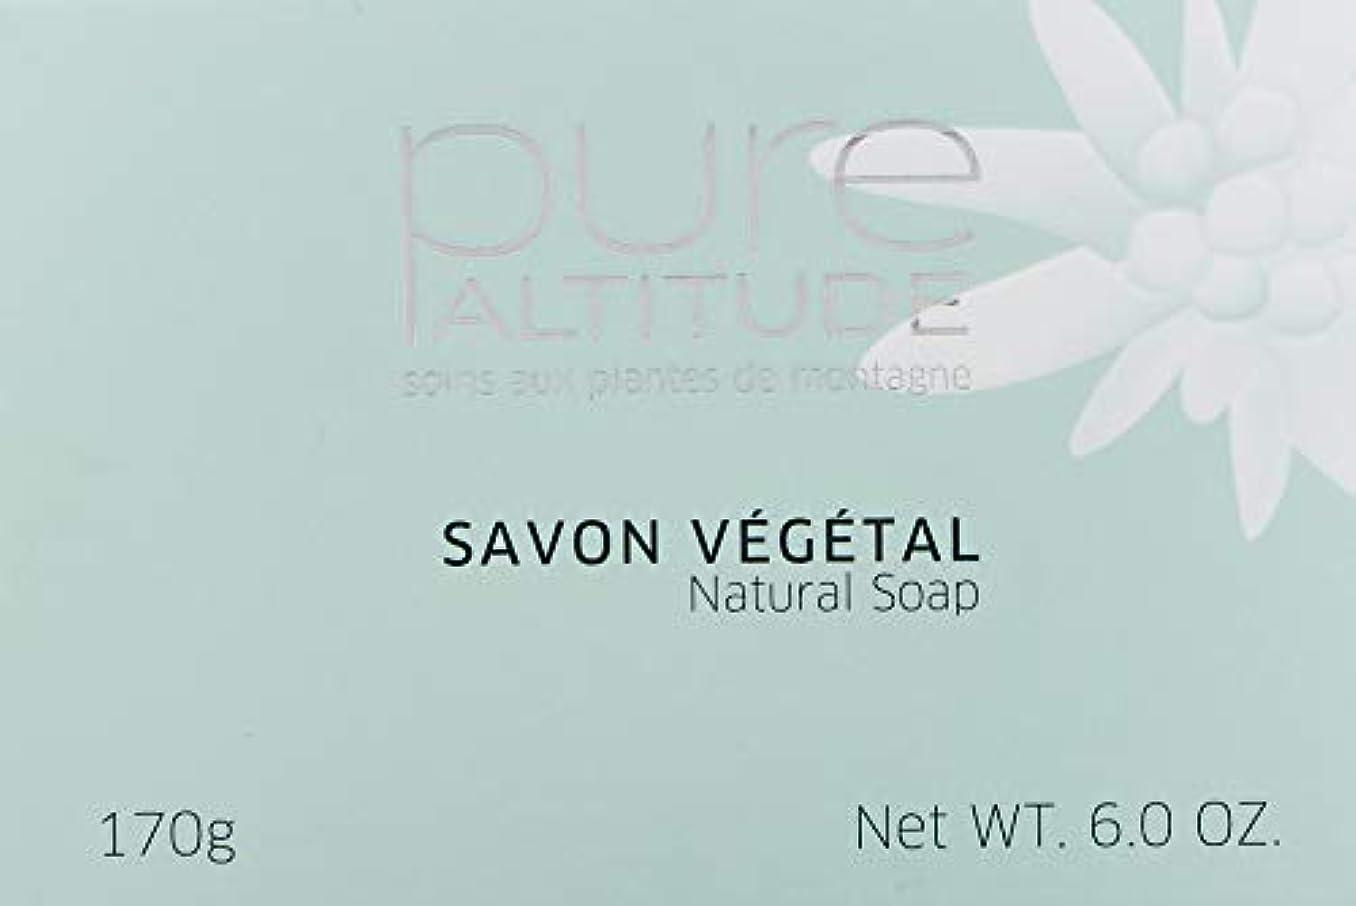 写真オアシス算術Pure(ピュール) SAVON VÉGÉTAL SENTEUR FLEURS DE NEIGE 170g